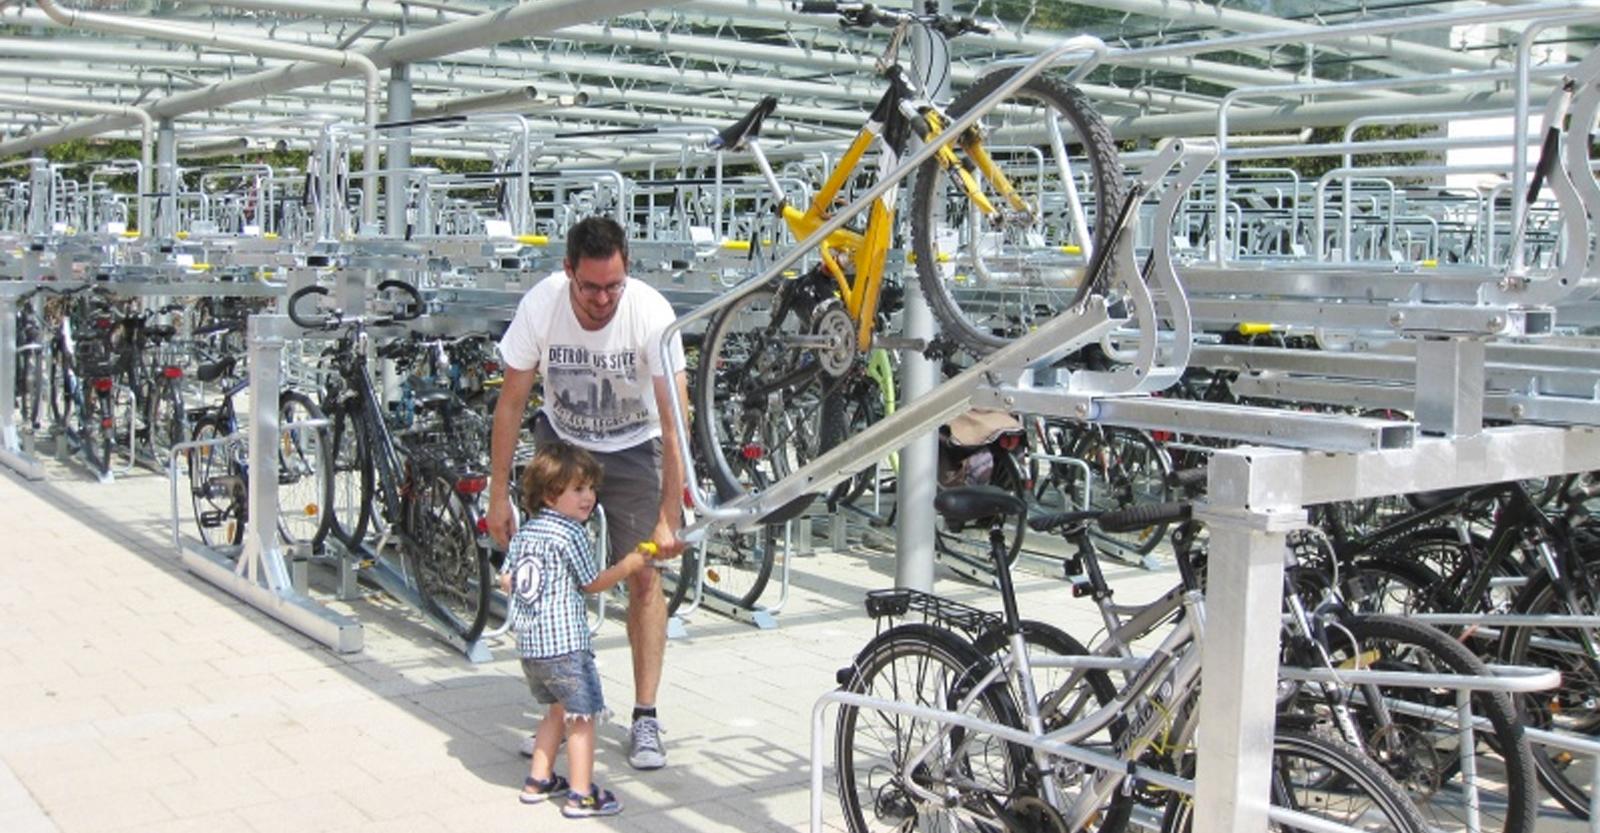 Dobbelt cykelparkering